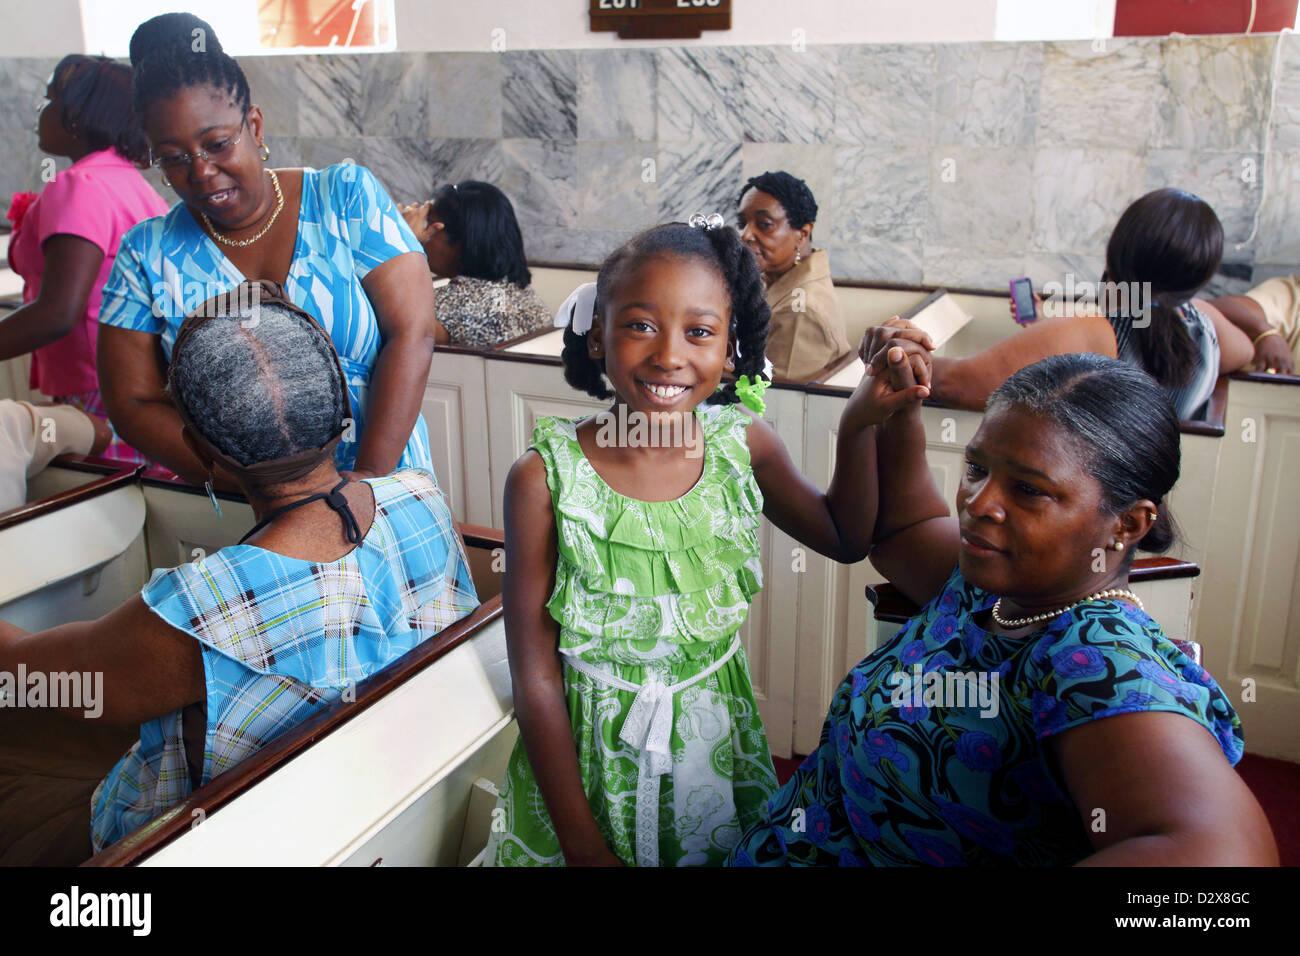 Before Sunday Mass, Frederick Evangelical Lutheran Church, Charlotte Amalie, St. Thomas, US Virgin Islands, Caribbean - Stock Image